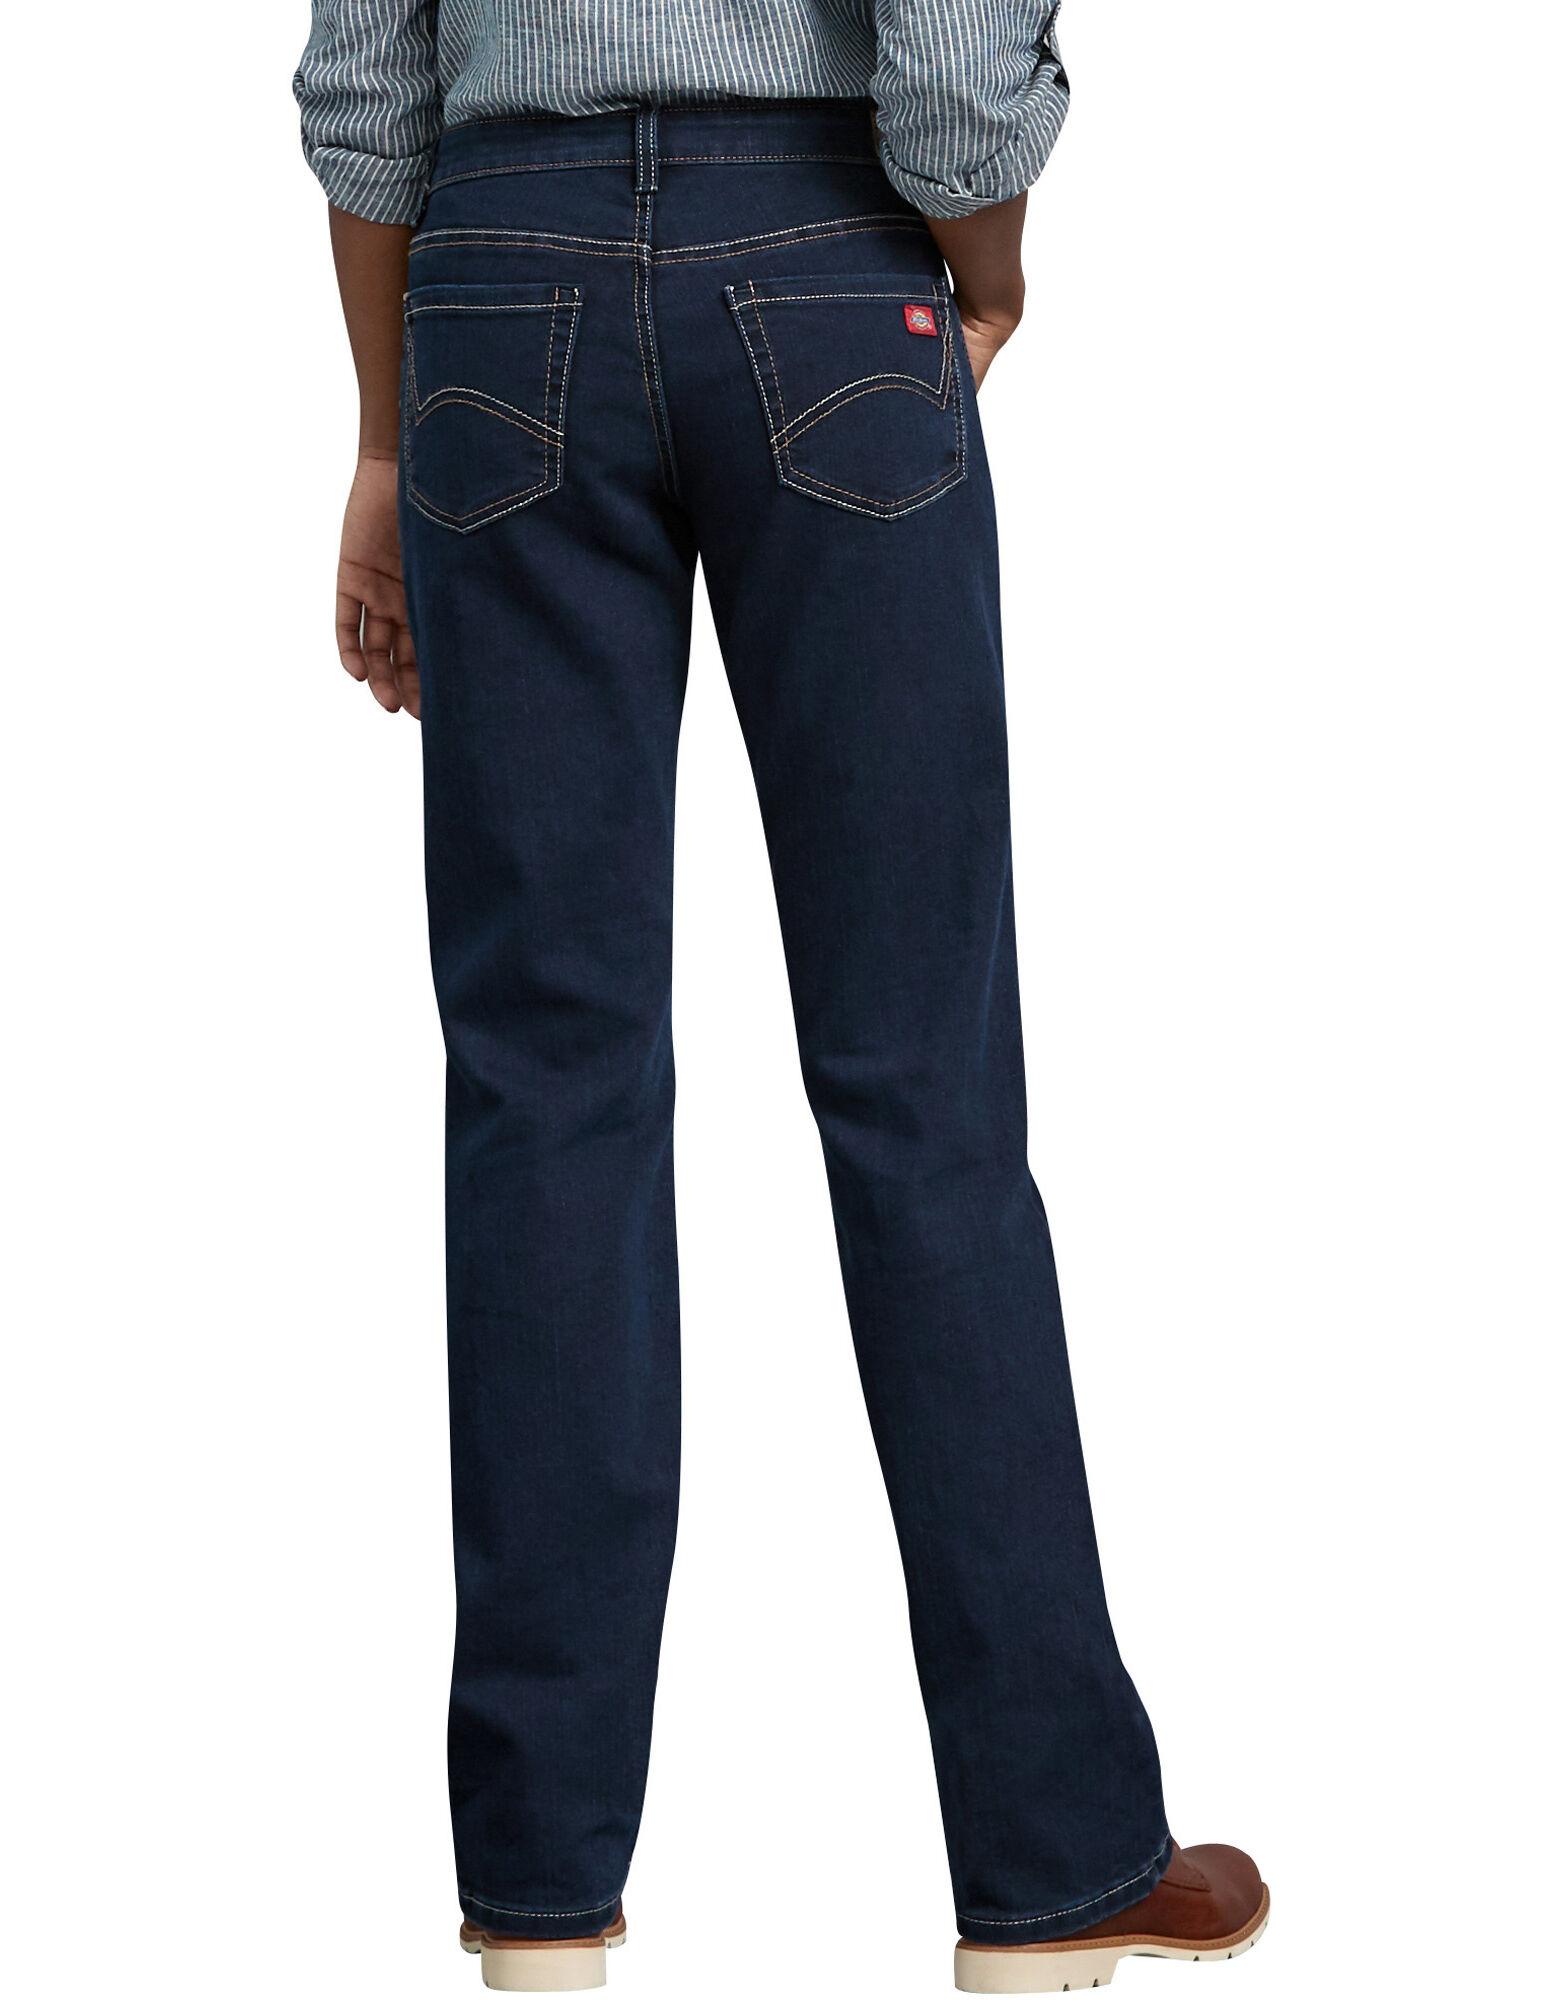 jeans extensible pour femmes dickies. Black Bedroom Furniture Sets. Home Design Ideas